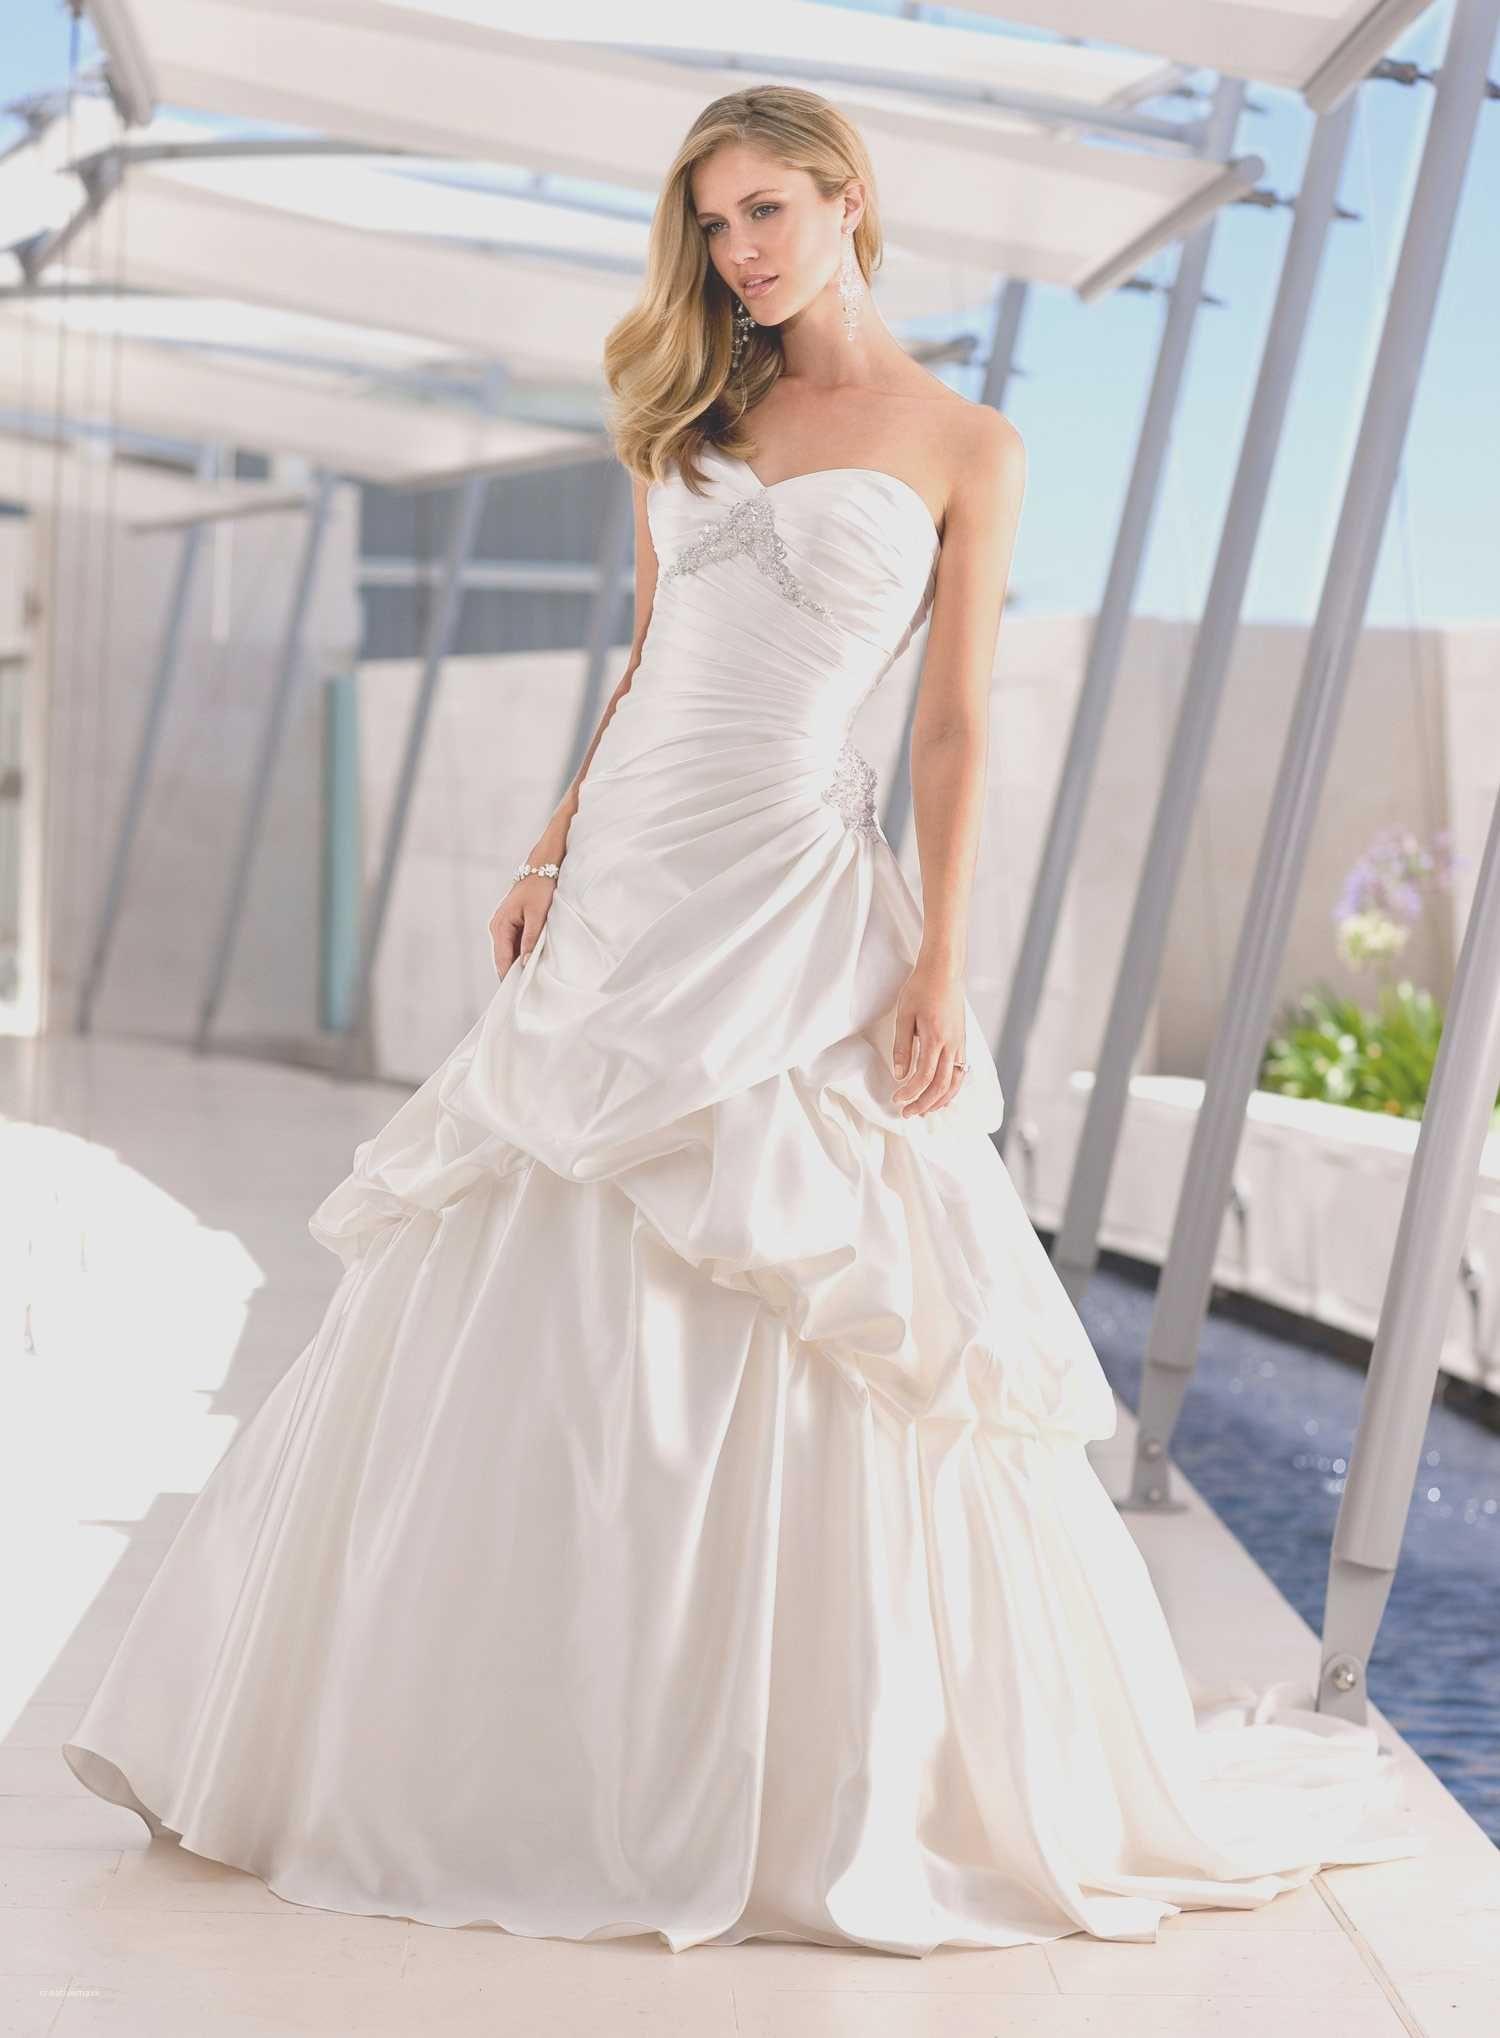 Beautiful Cheap Looking Wedding Dresses | Wedding and Weddings